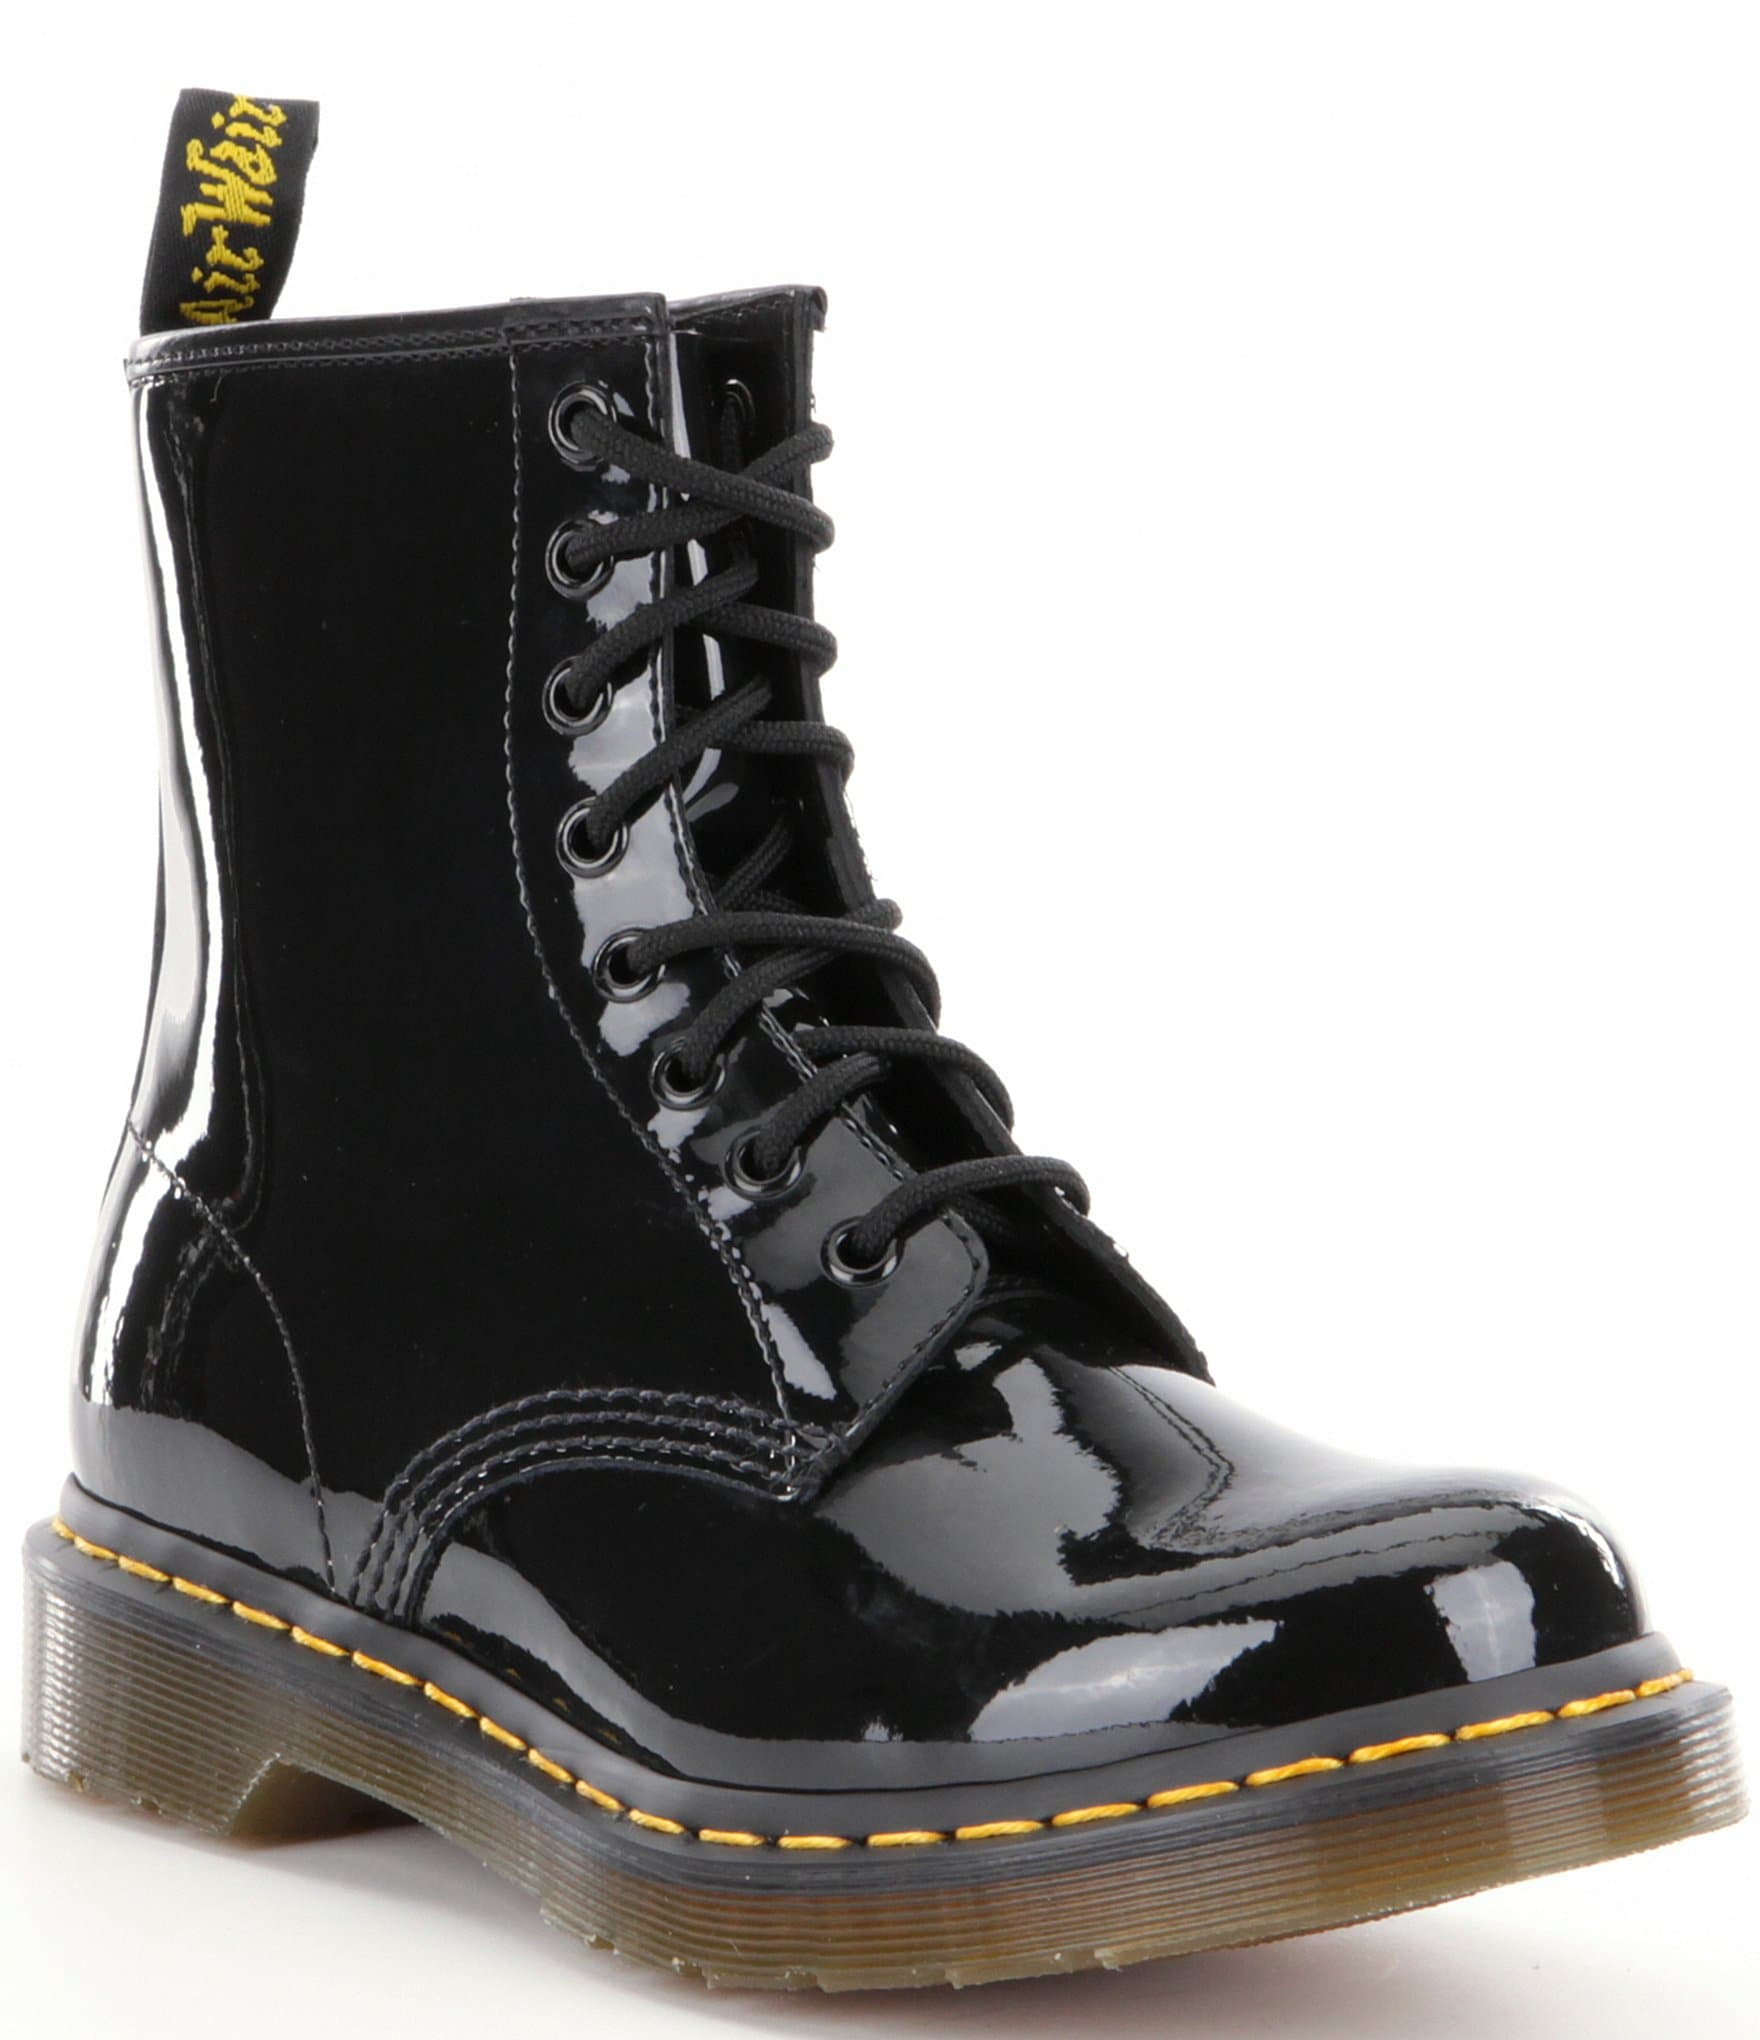 dr martens 1460 women s boots dillards. Black Bedroom Furniture Sets. Home Design Ideas